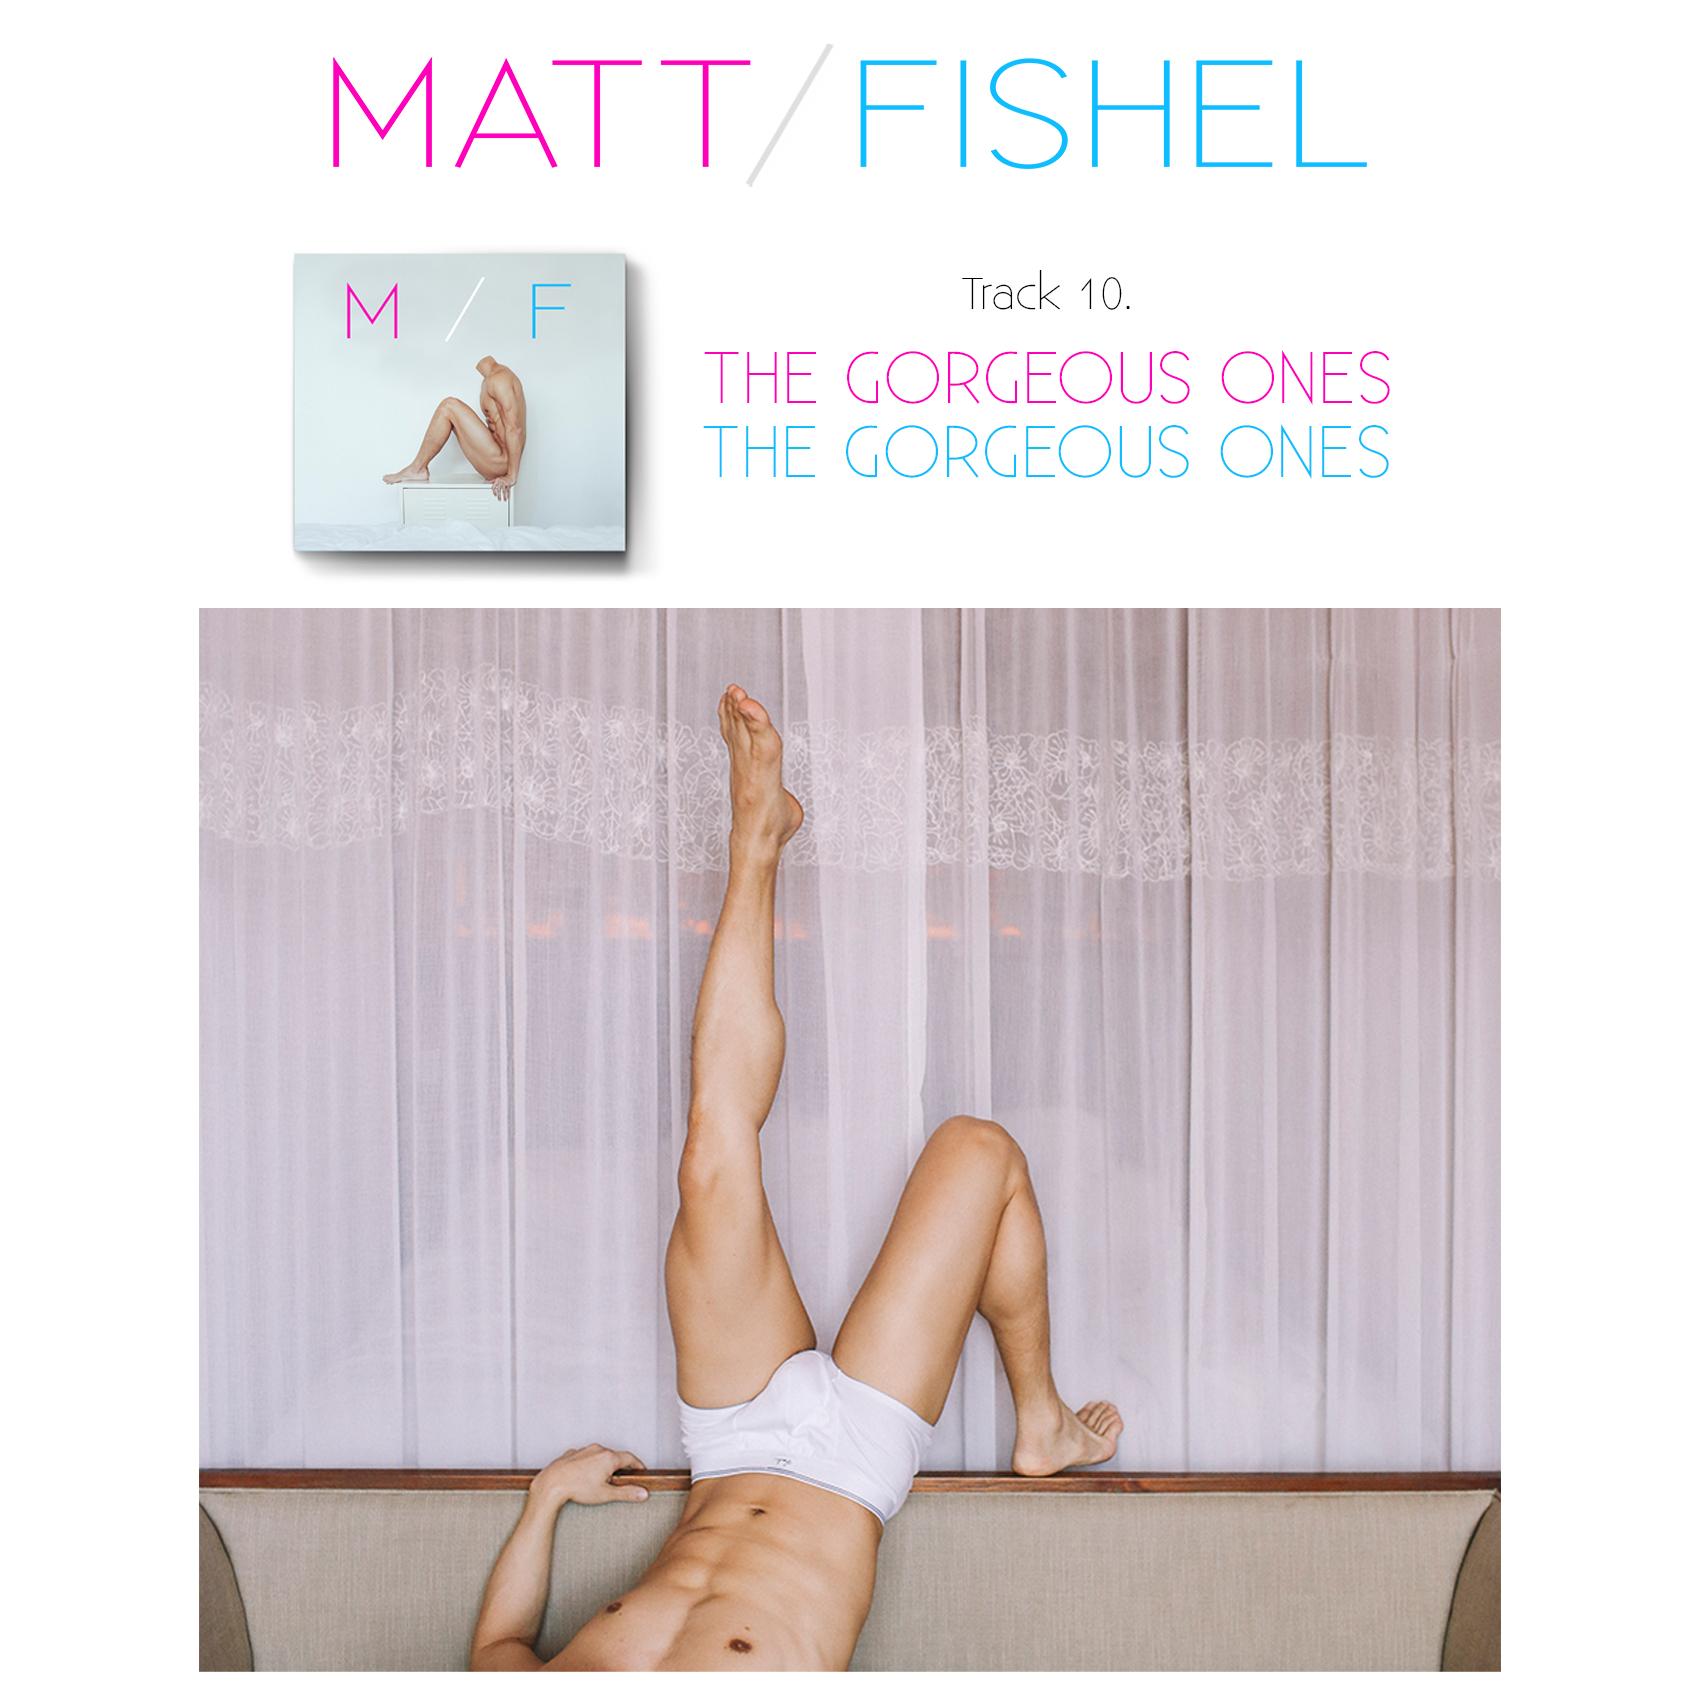 Matt Fishel_MF_Track 10_The Gorgeous Ones 2.jpg